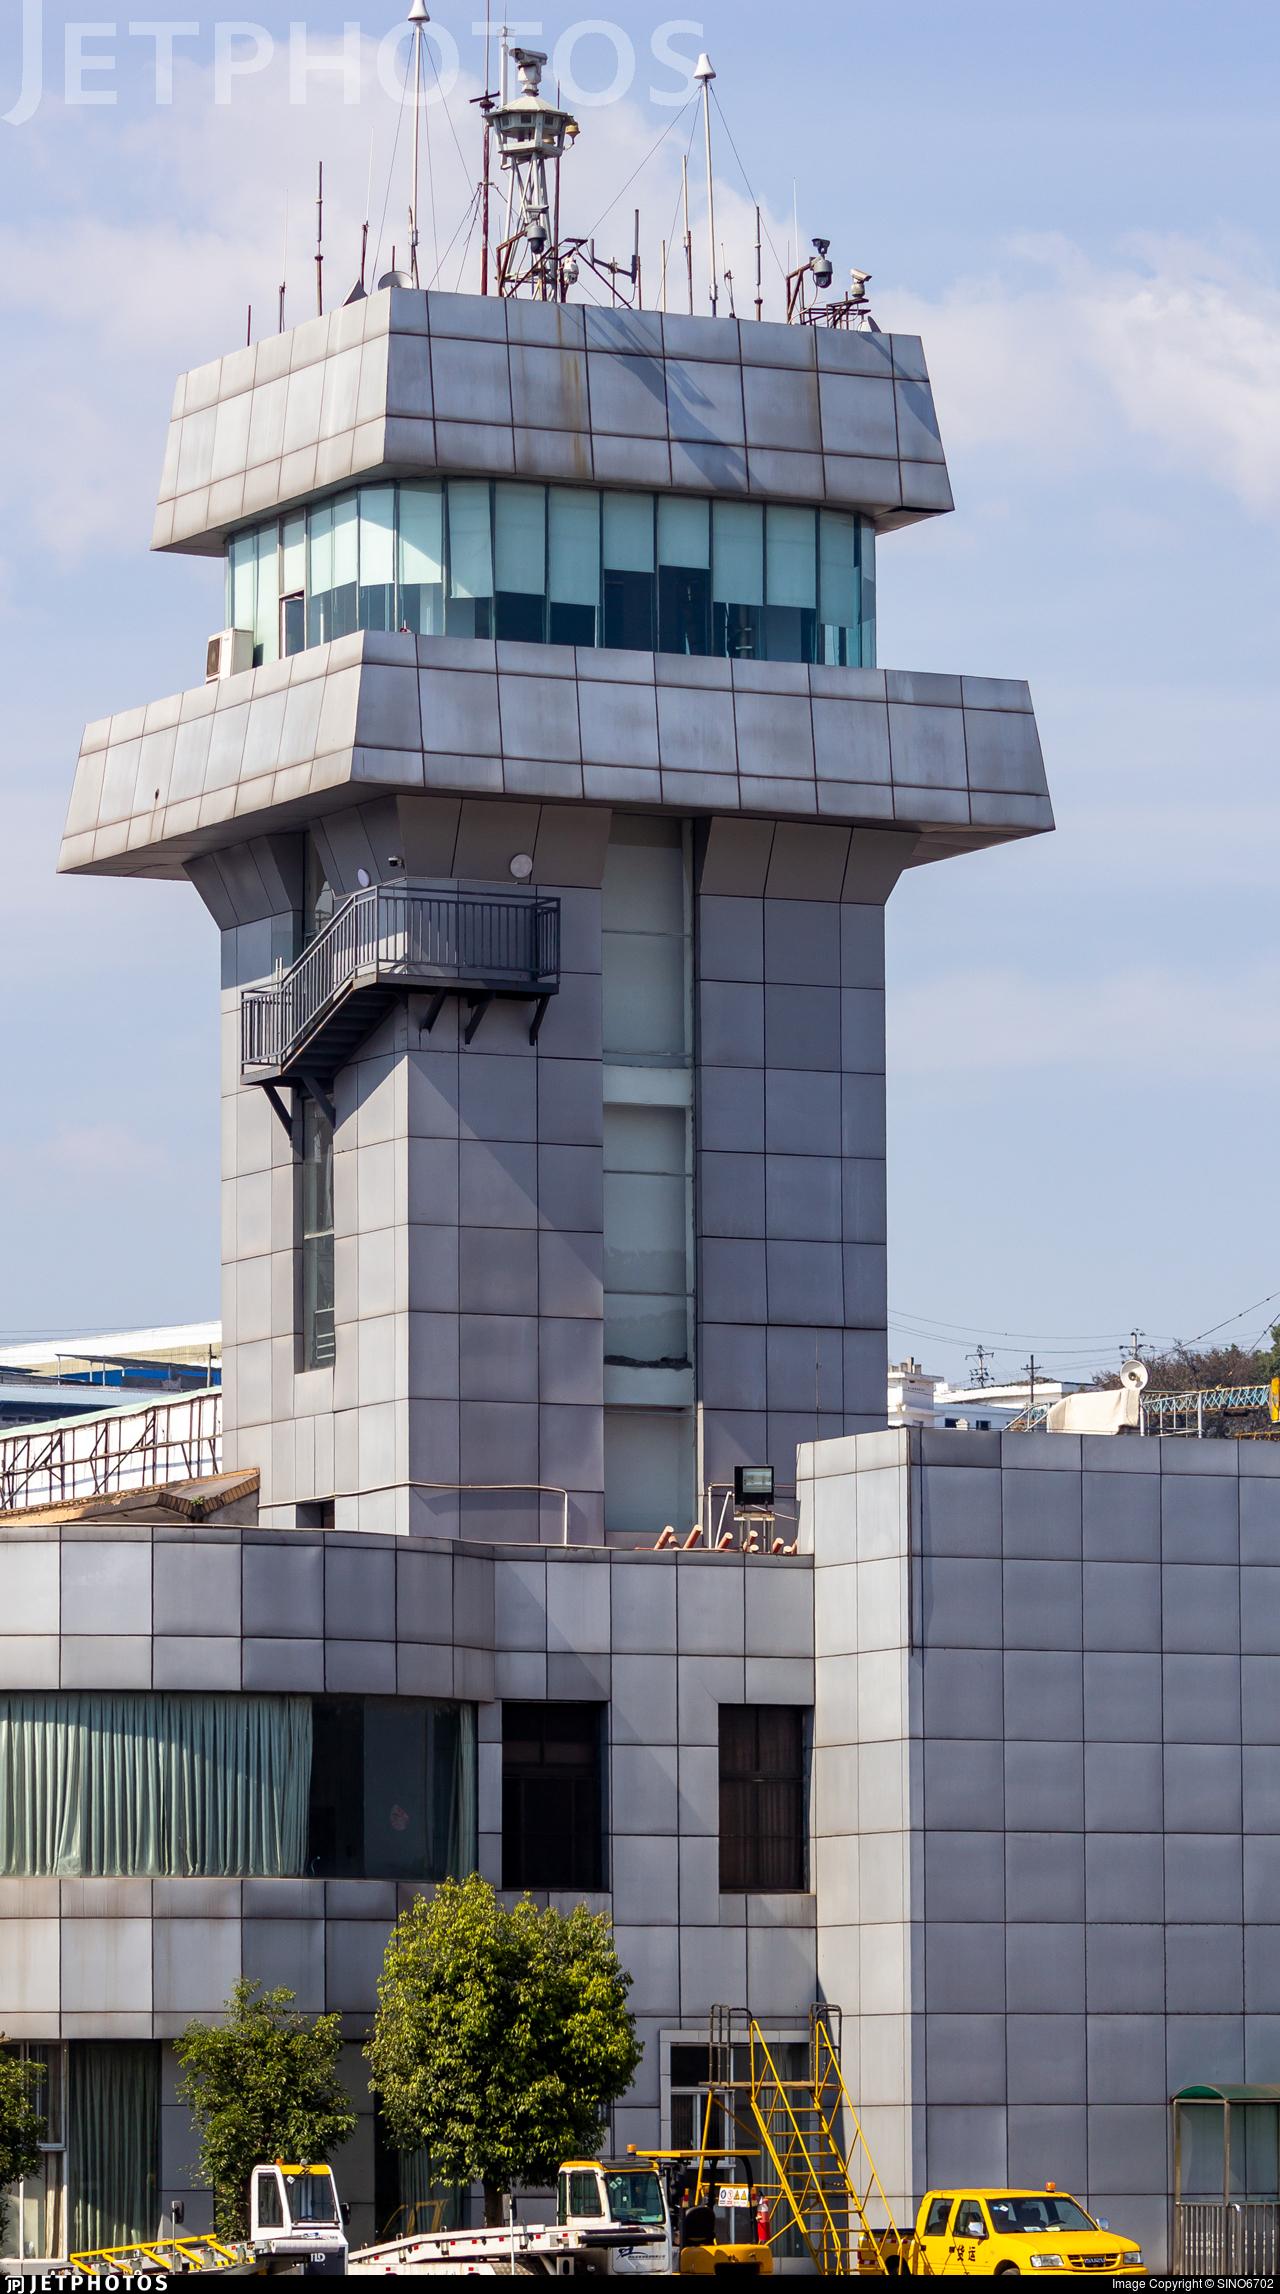 ZUDX - Airport - Control Tower